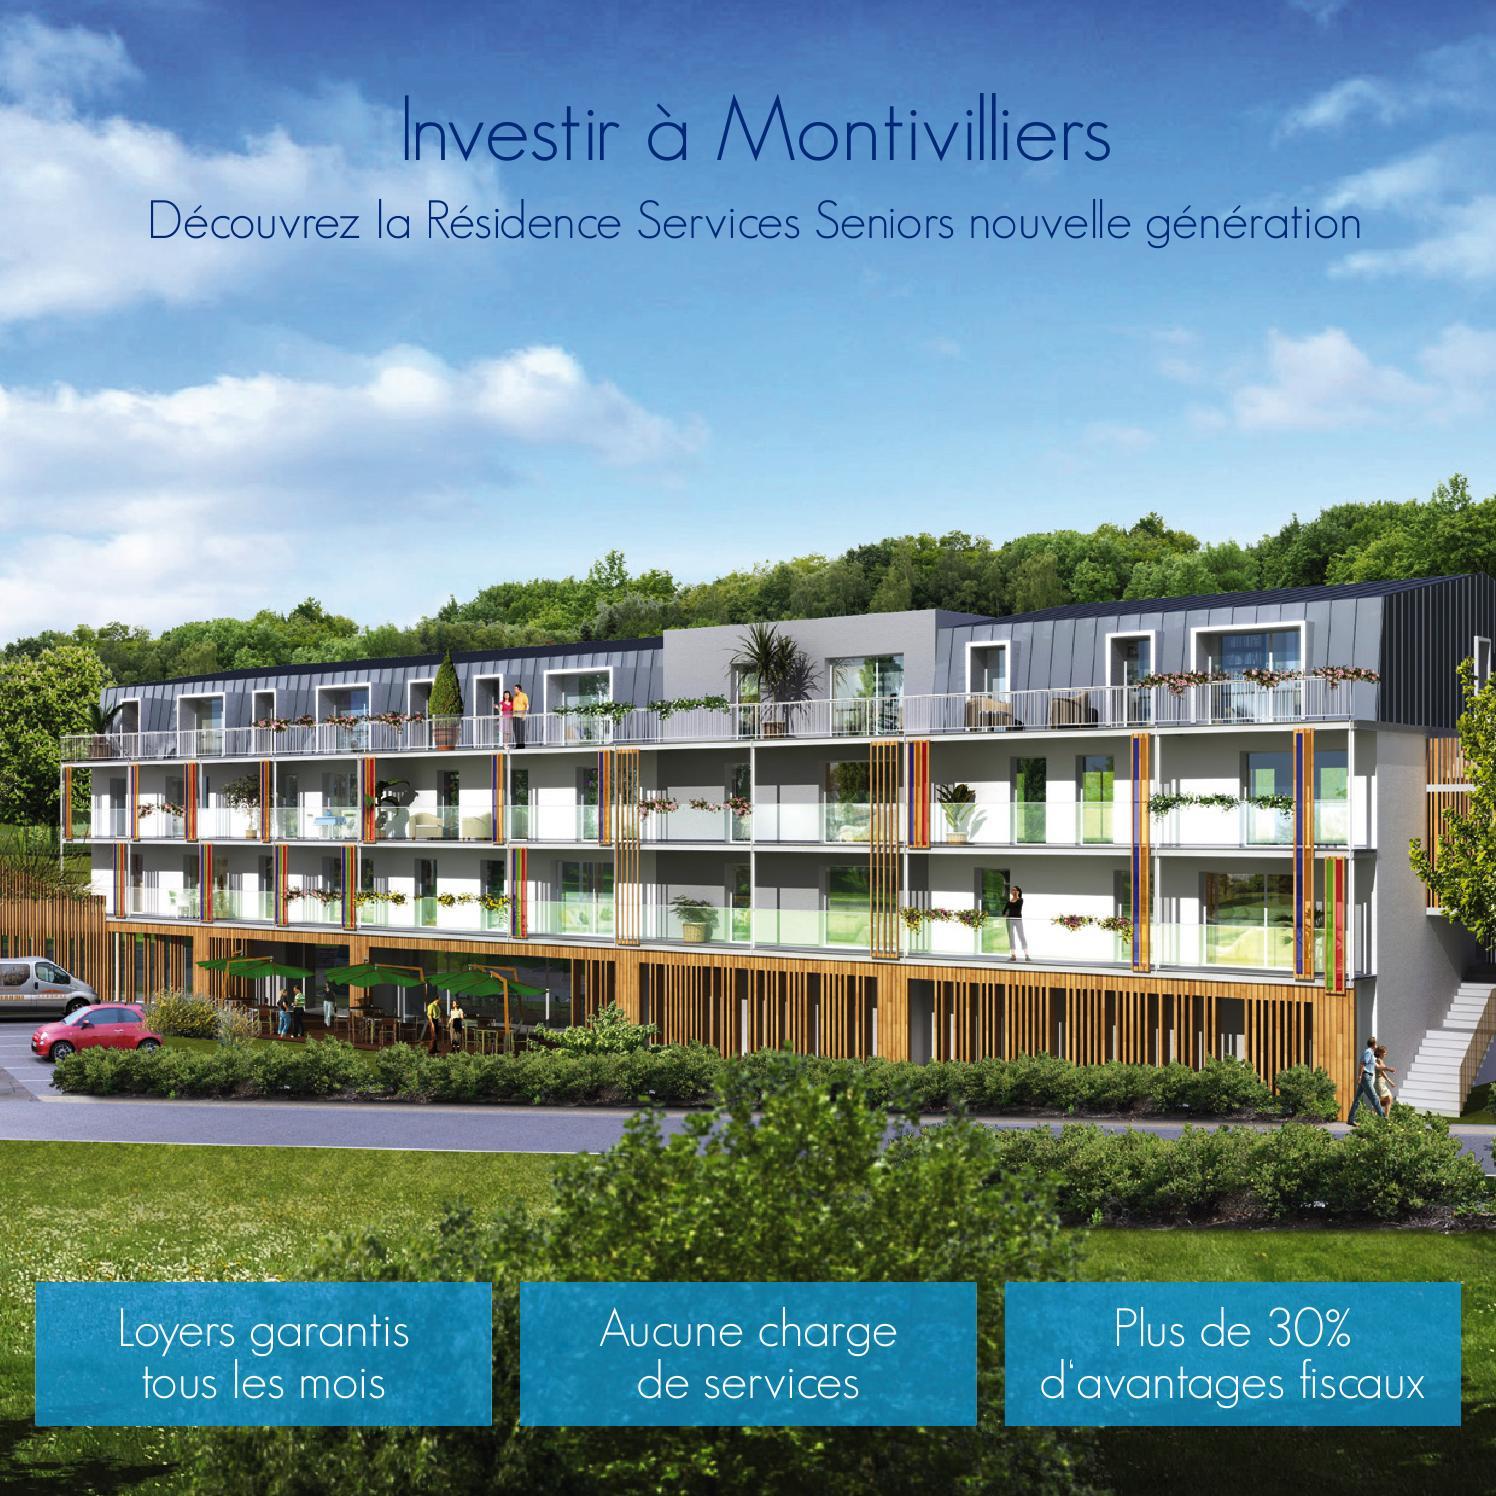 Investir À Montivilliers By Domitys Invest - Issuu intérieur Piscine Montivilliers